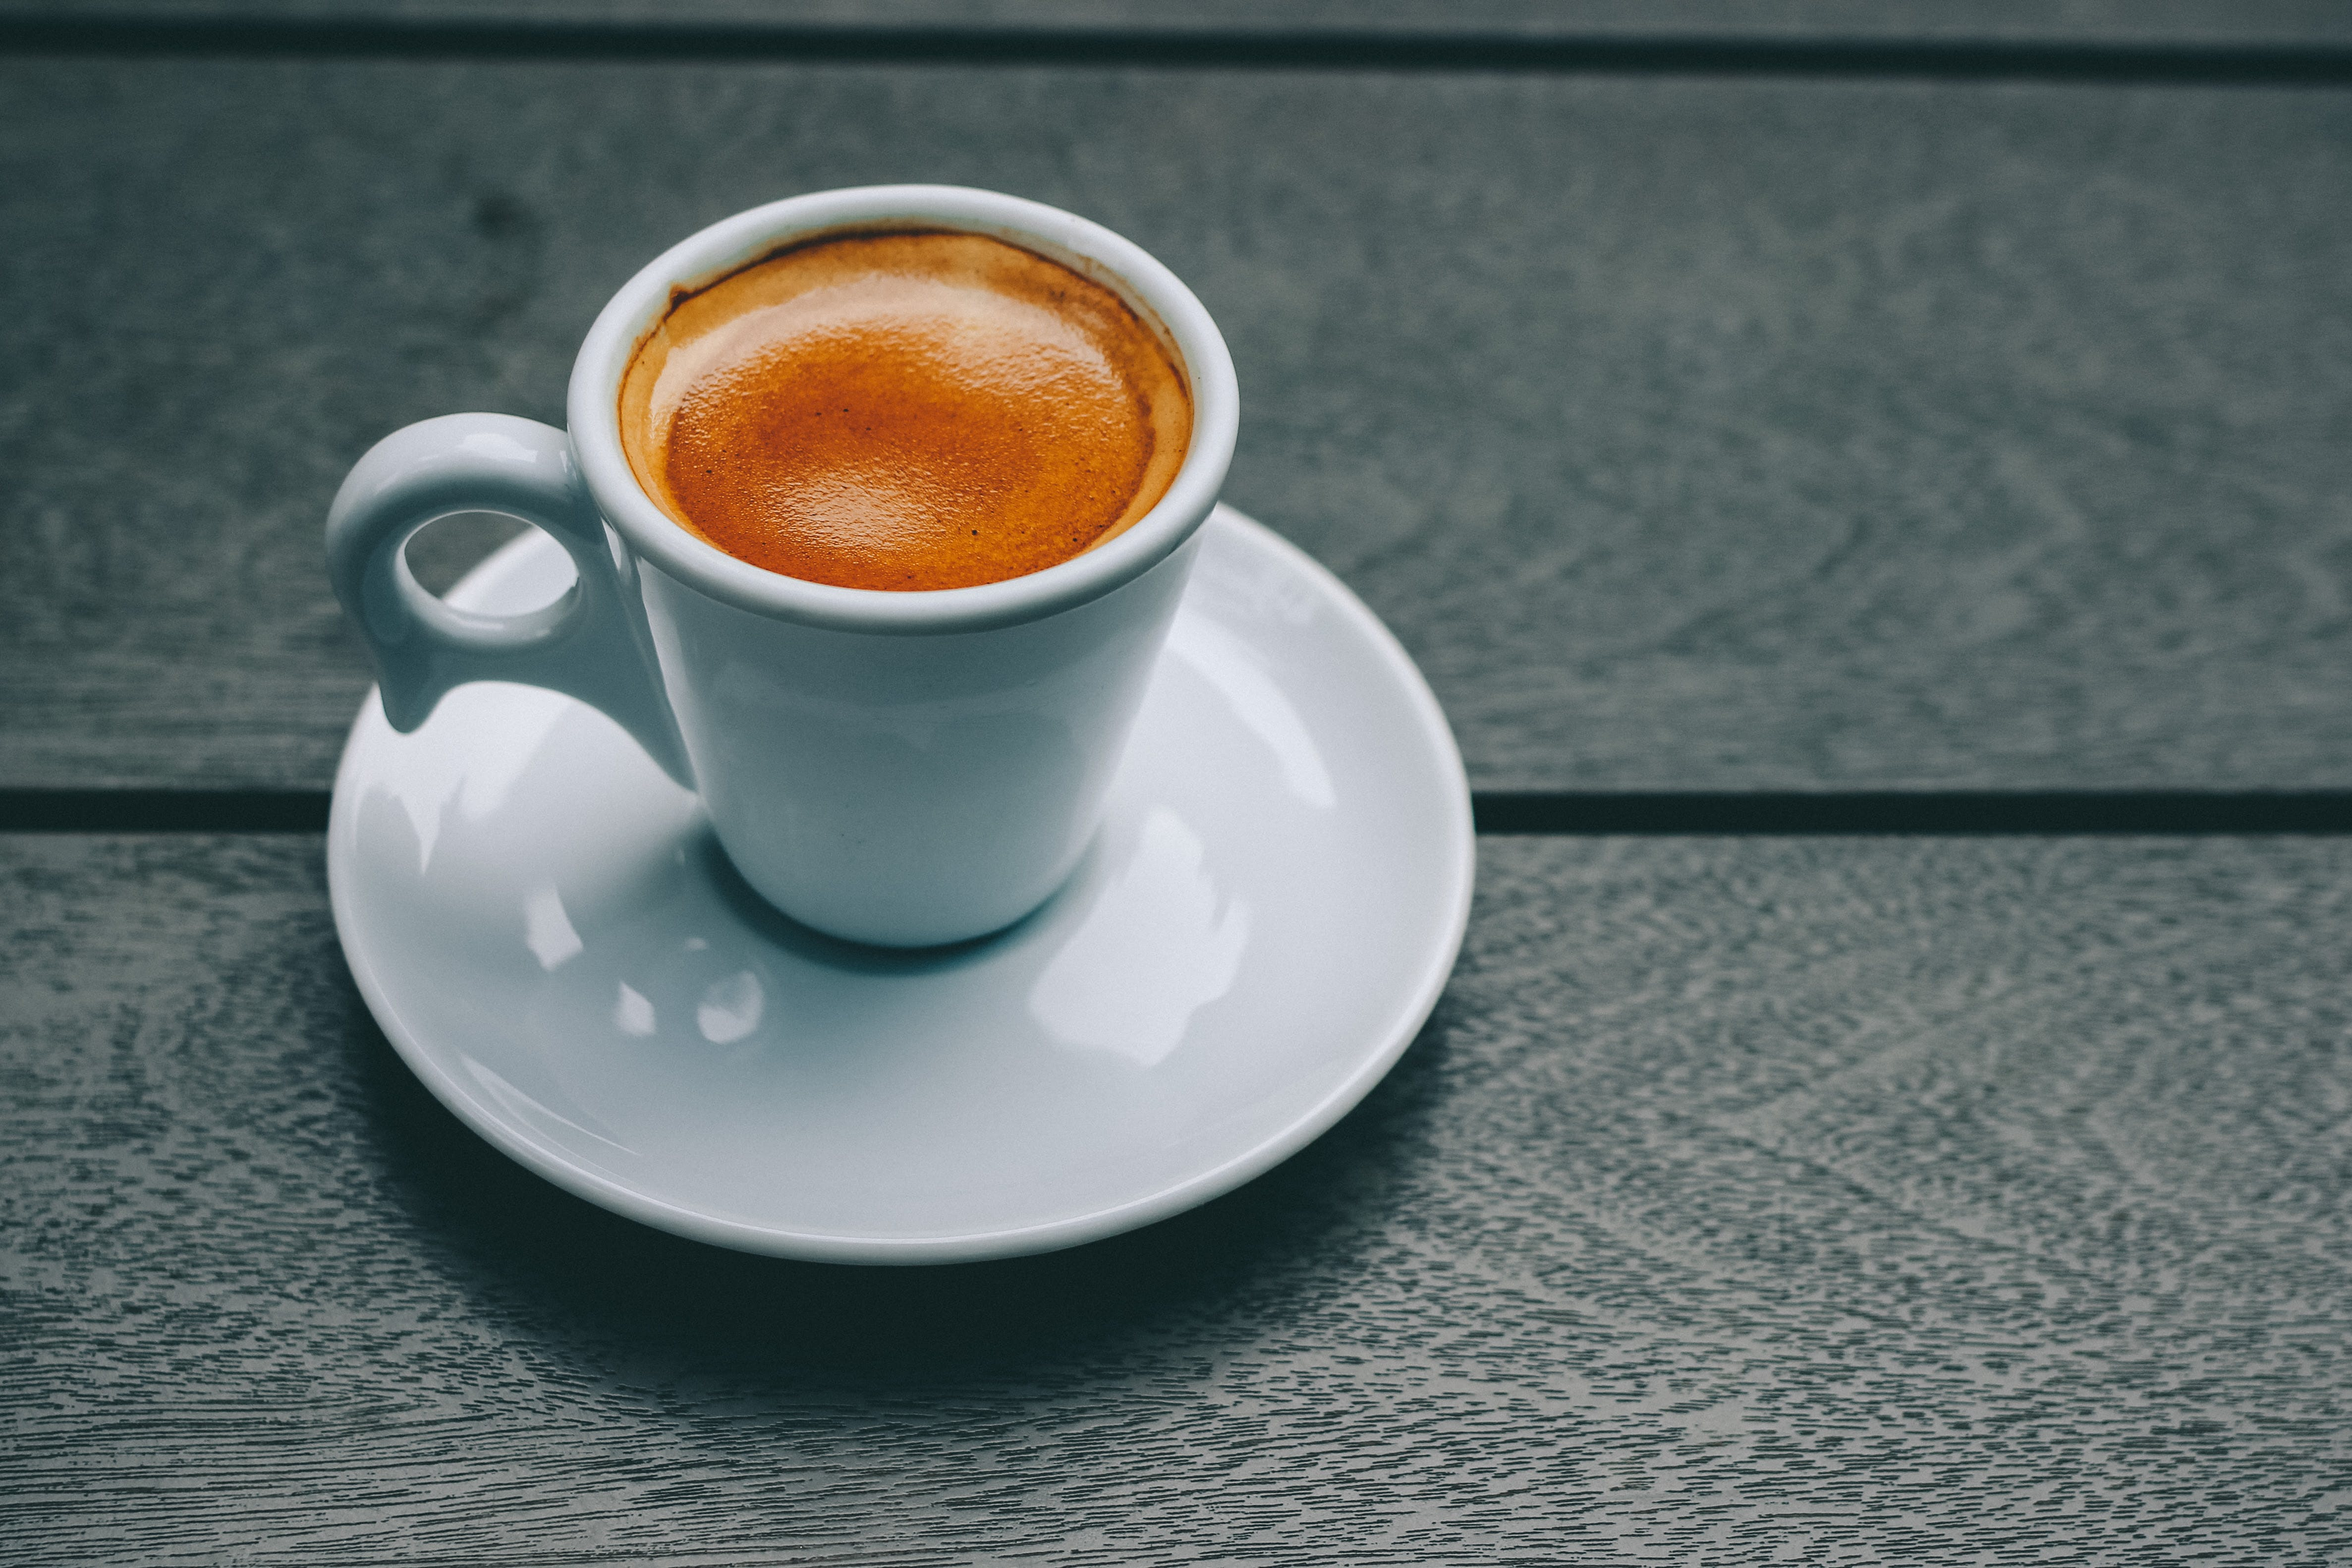 Чашка с эспрессо